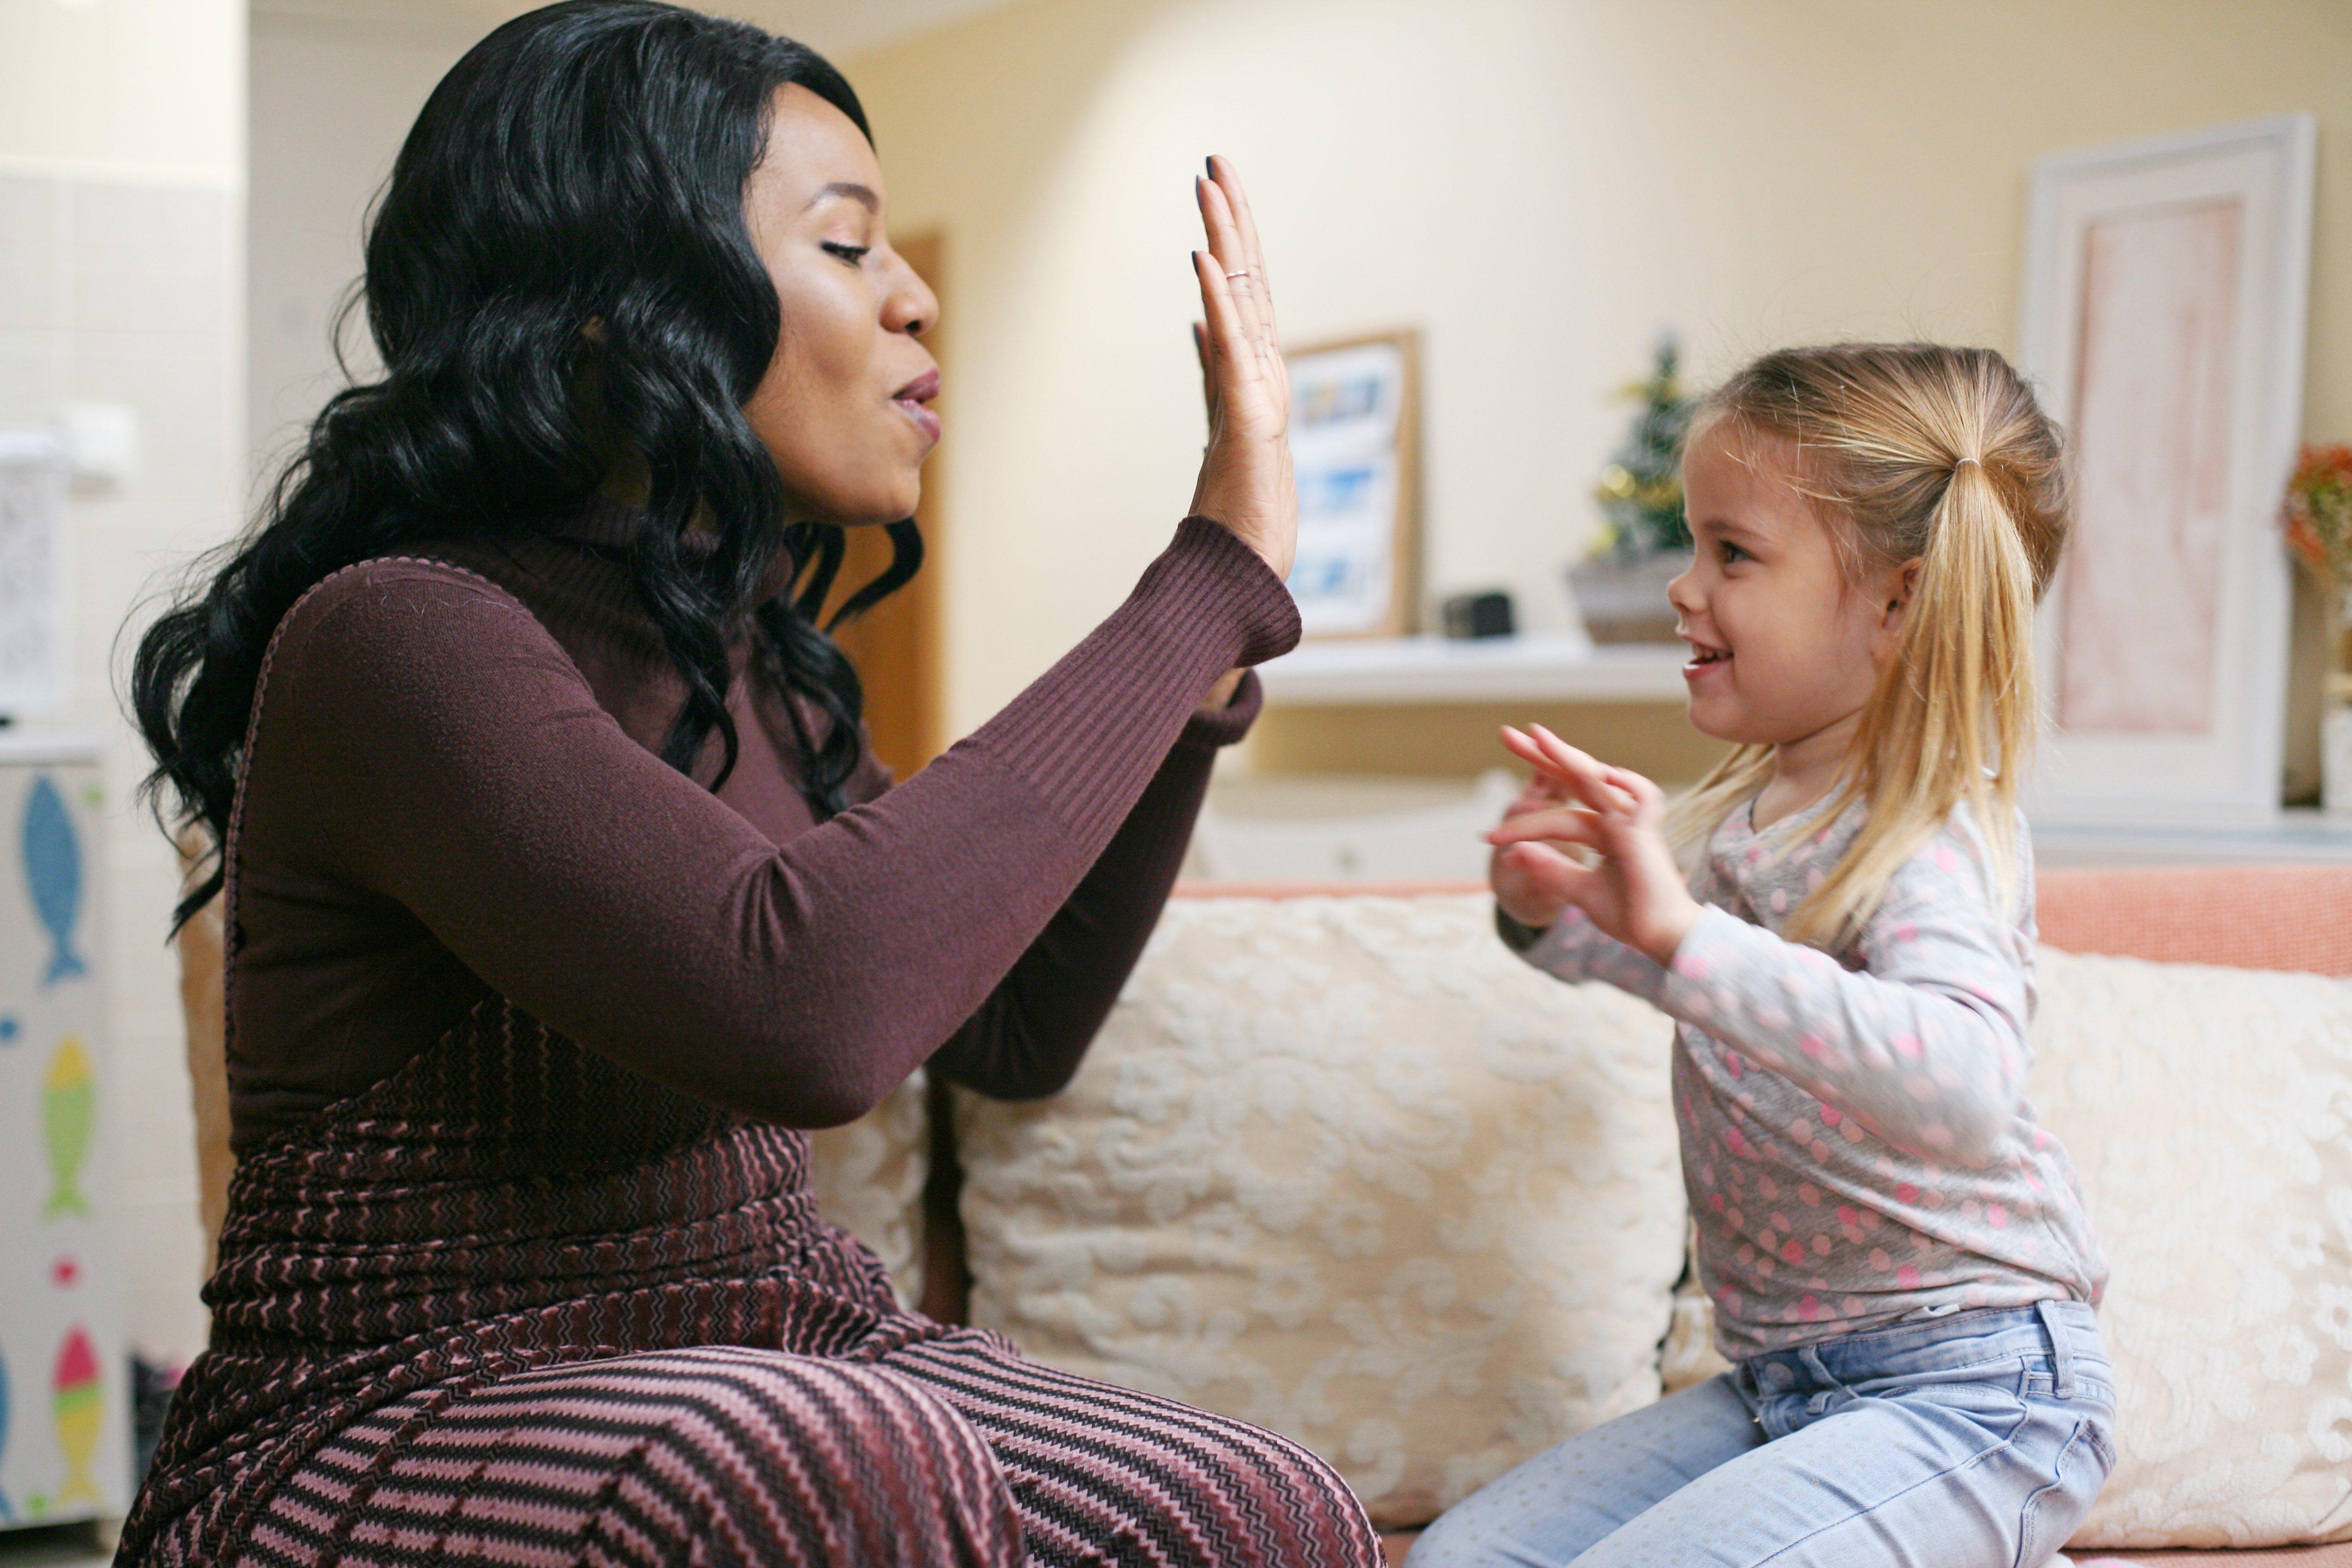 African American woman playing with girl.; Shutterstock ID 583567765; Job (TFH, TOH, RD, BNB, CWM, CM): RD